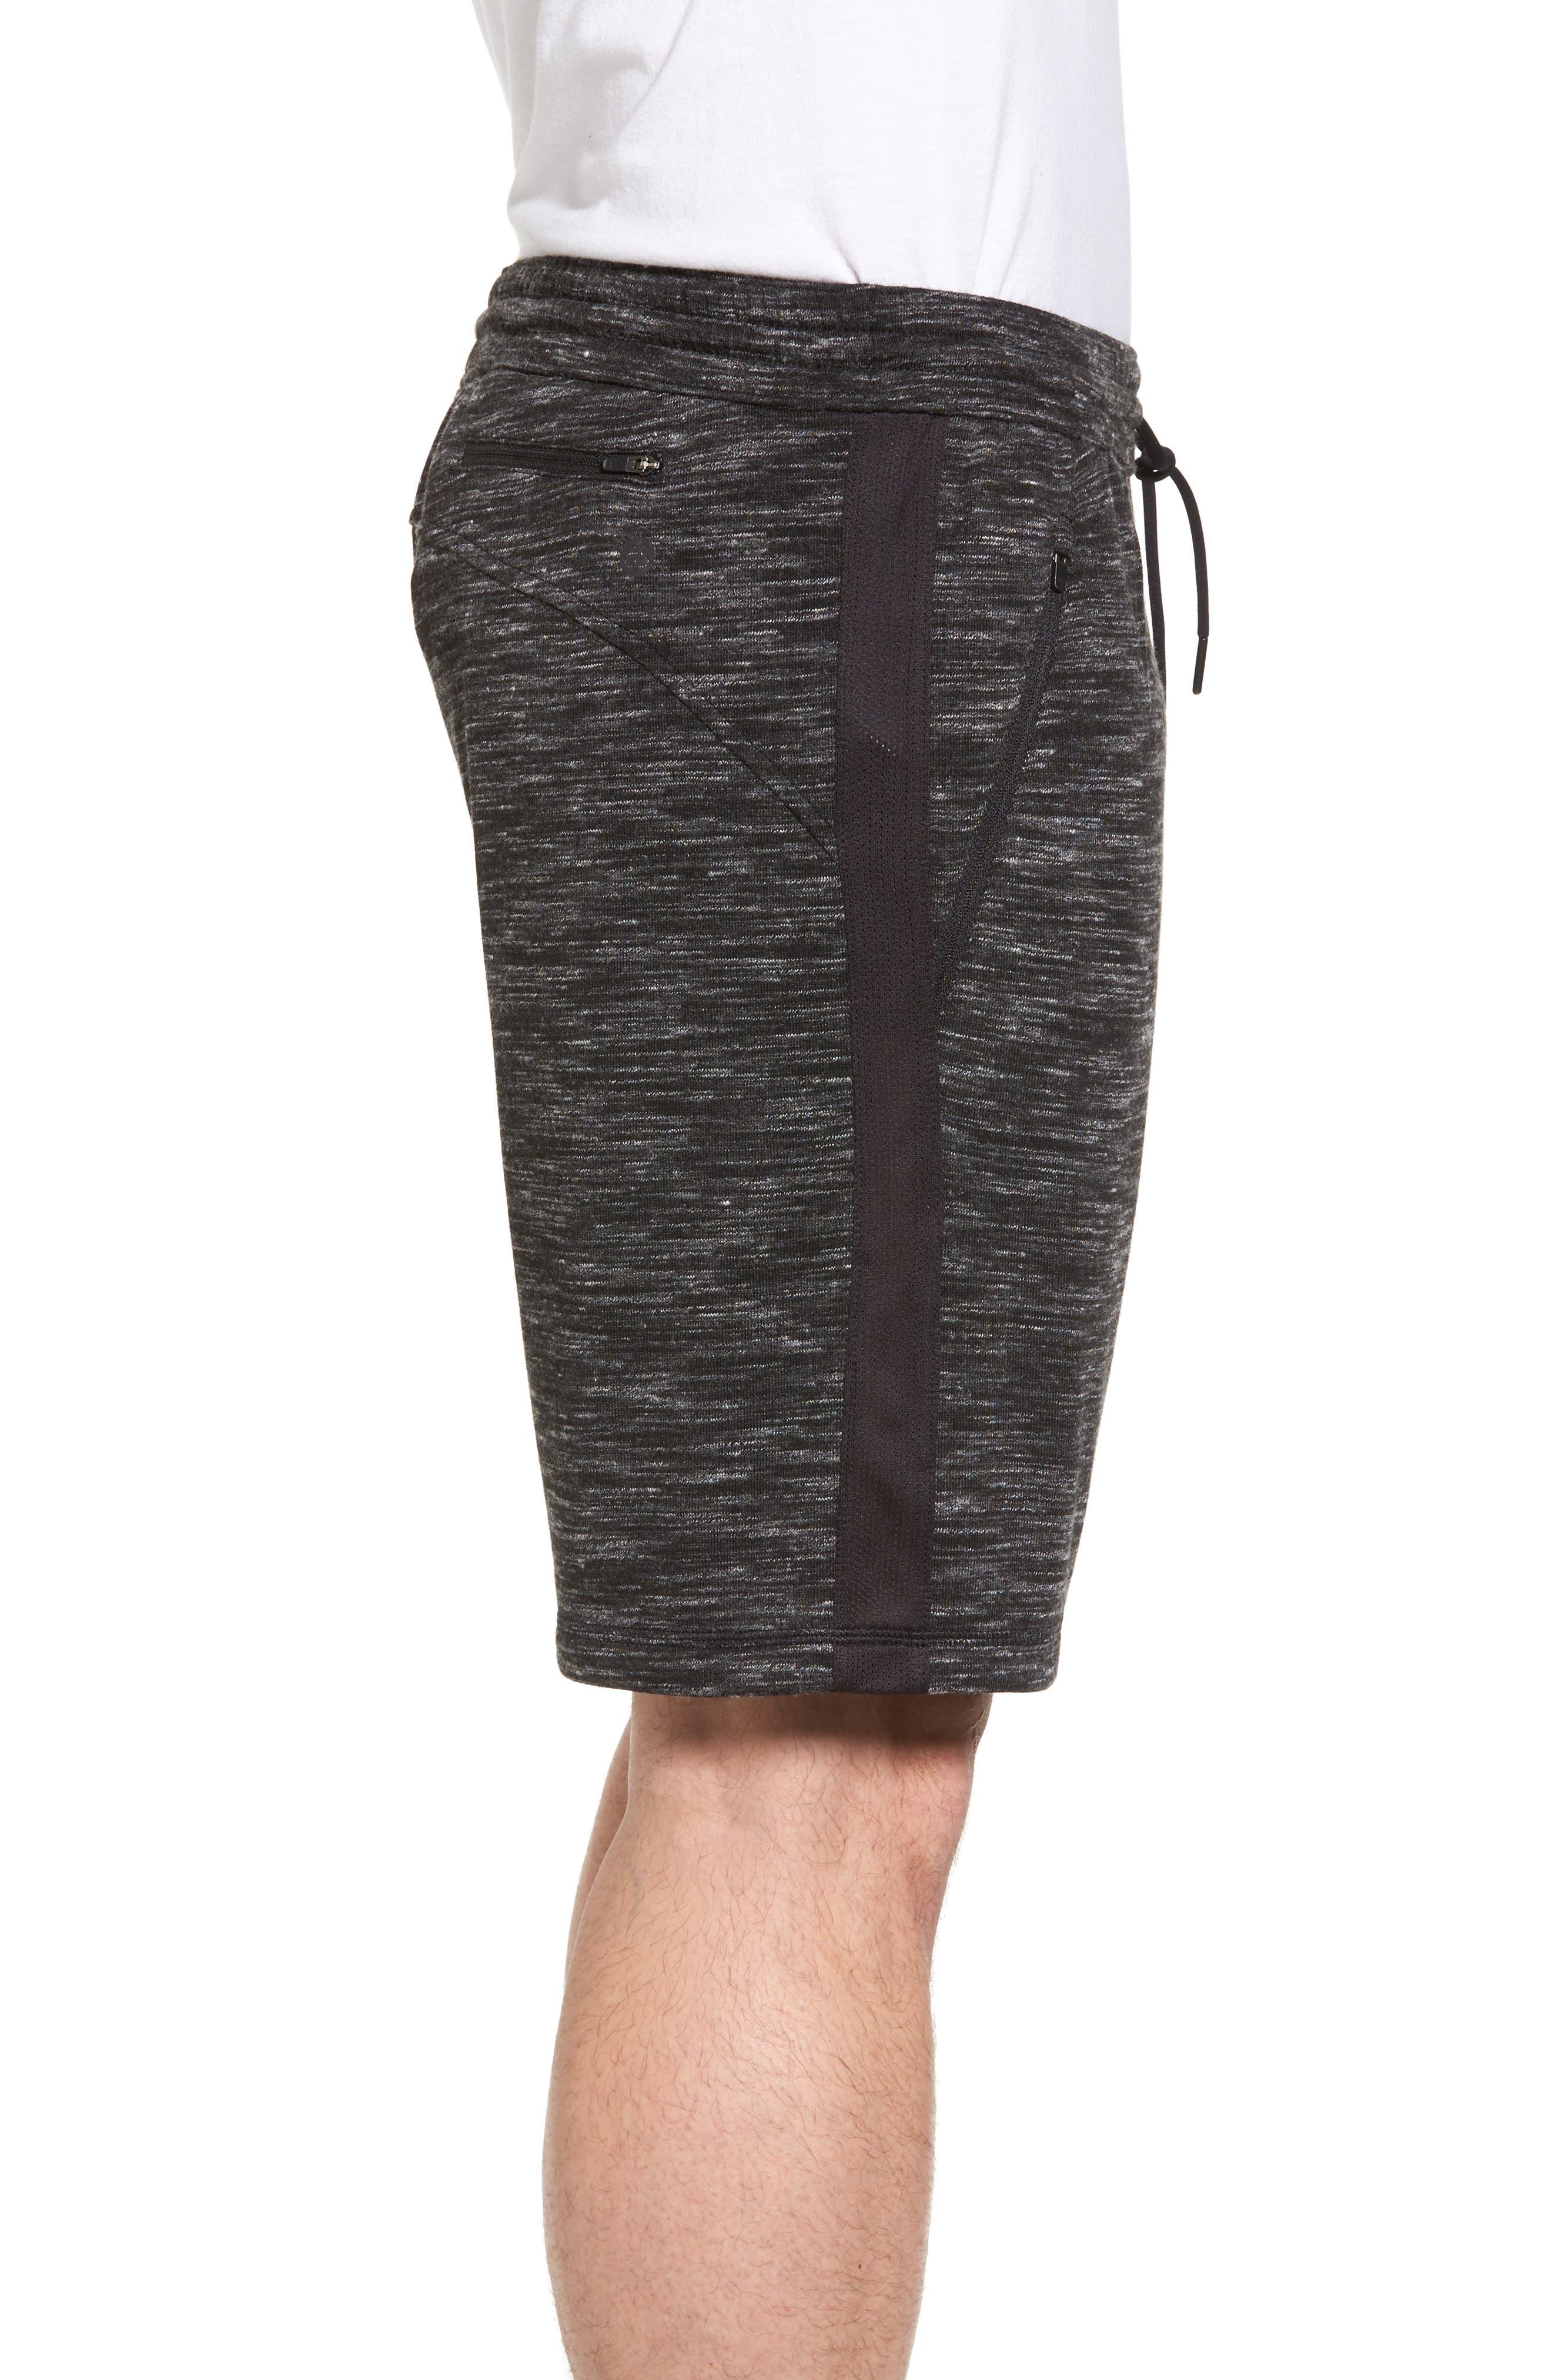 Neptune Terrycloth Shorts,                             Alternate thumbnail 3, color,                             Black Oxide Melange